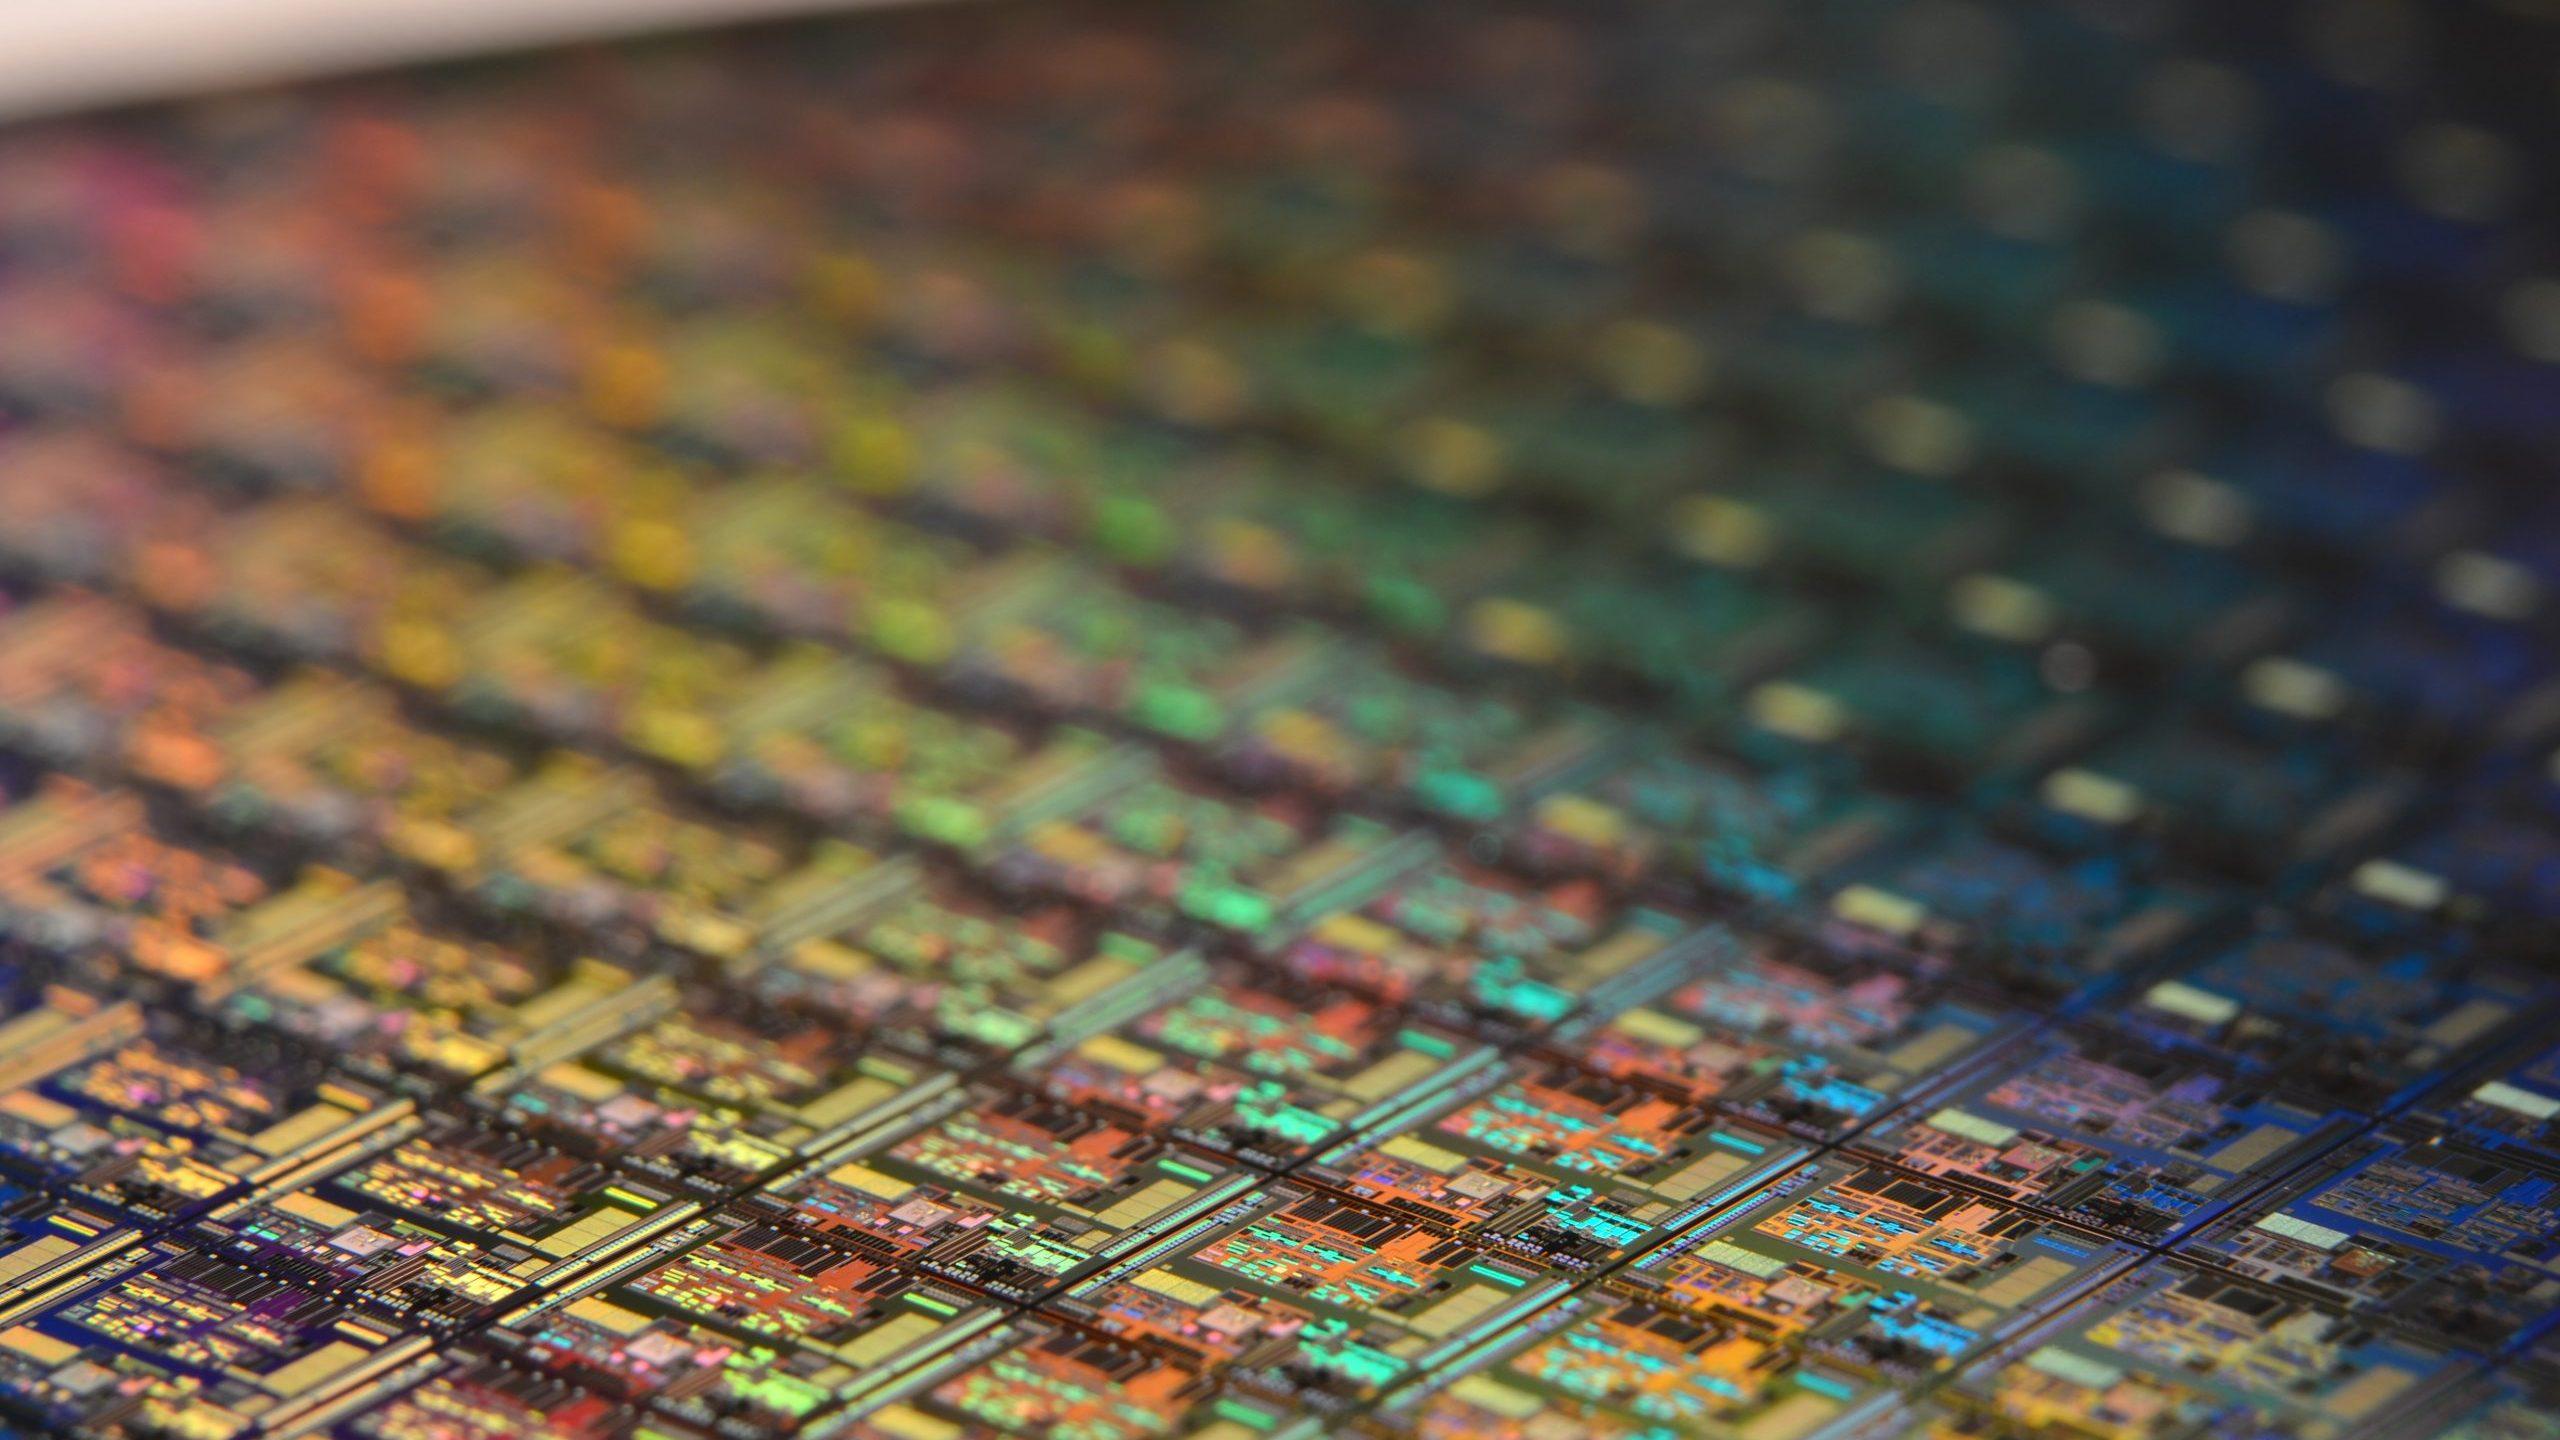 DNA computers take shape